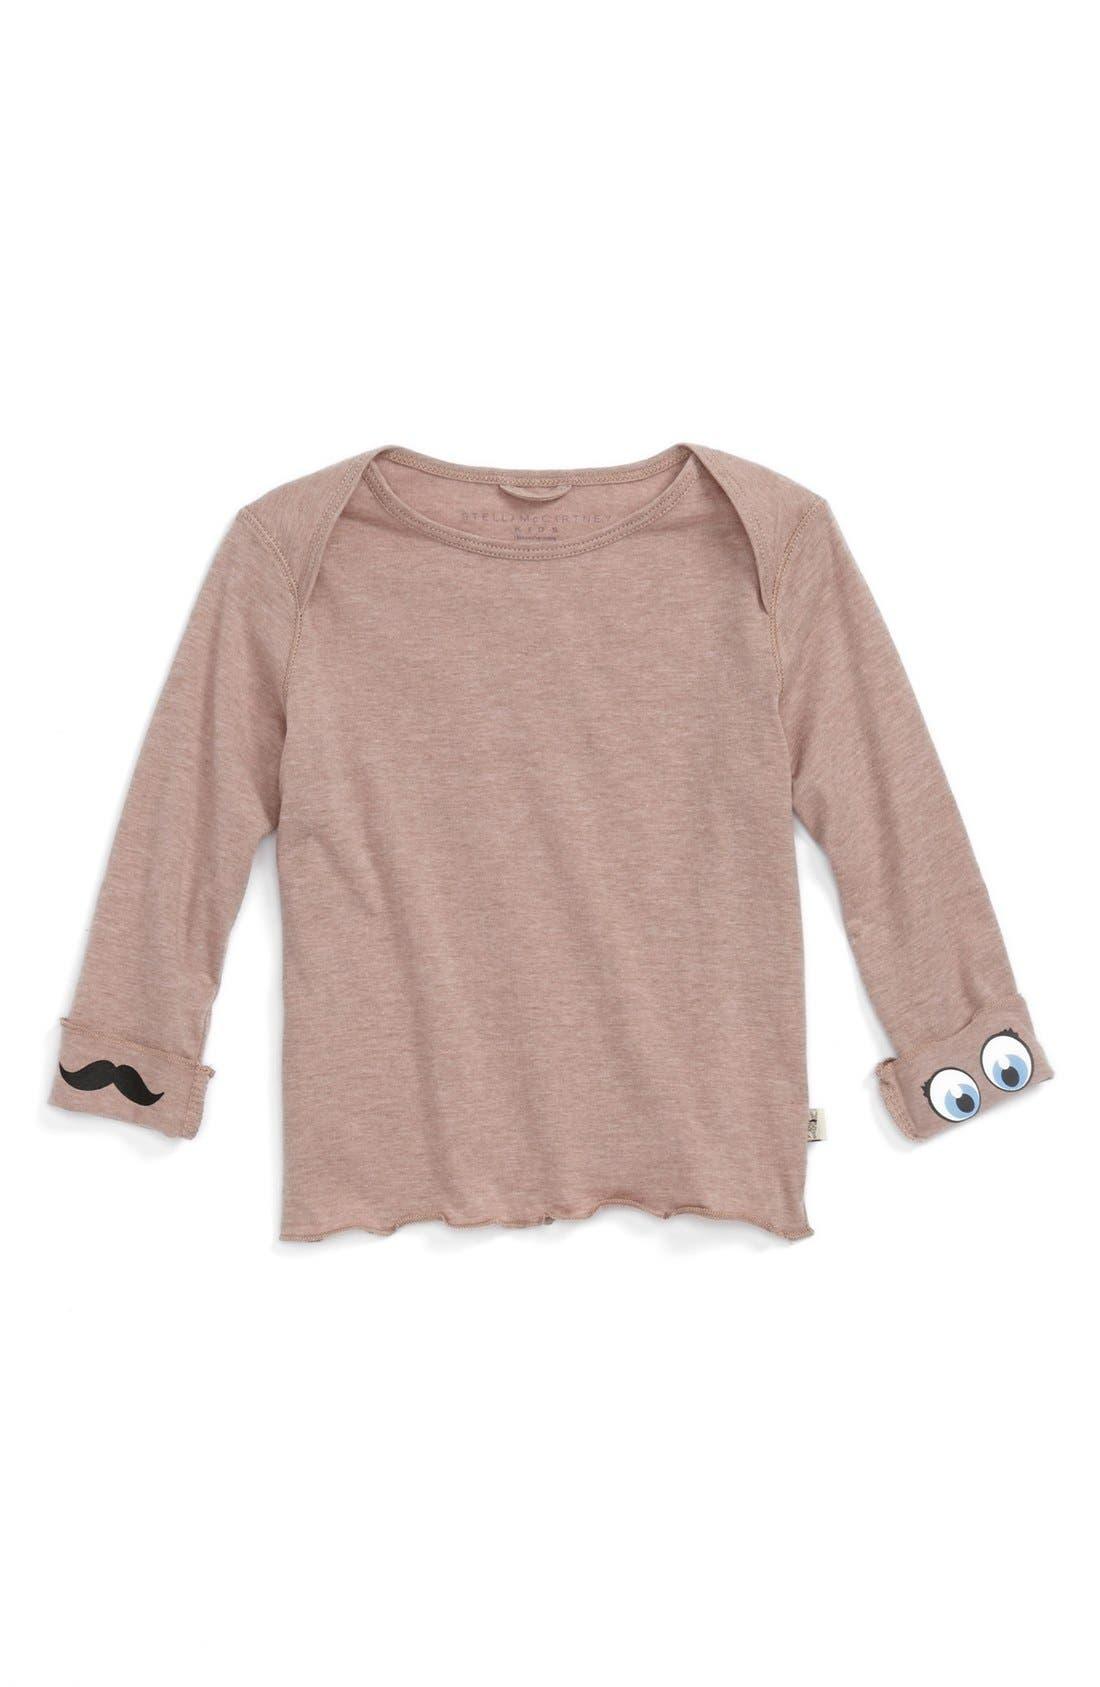 Alternate Image 1 Selected - Stella McCartney Kids 'Buster' T-Shirt (Baby Girls)